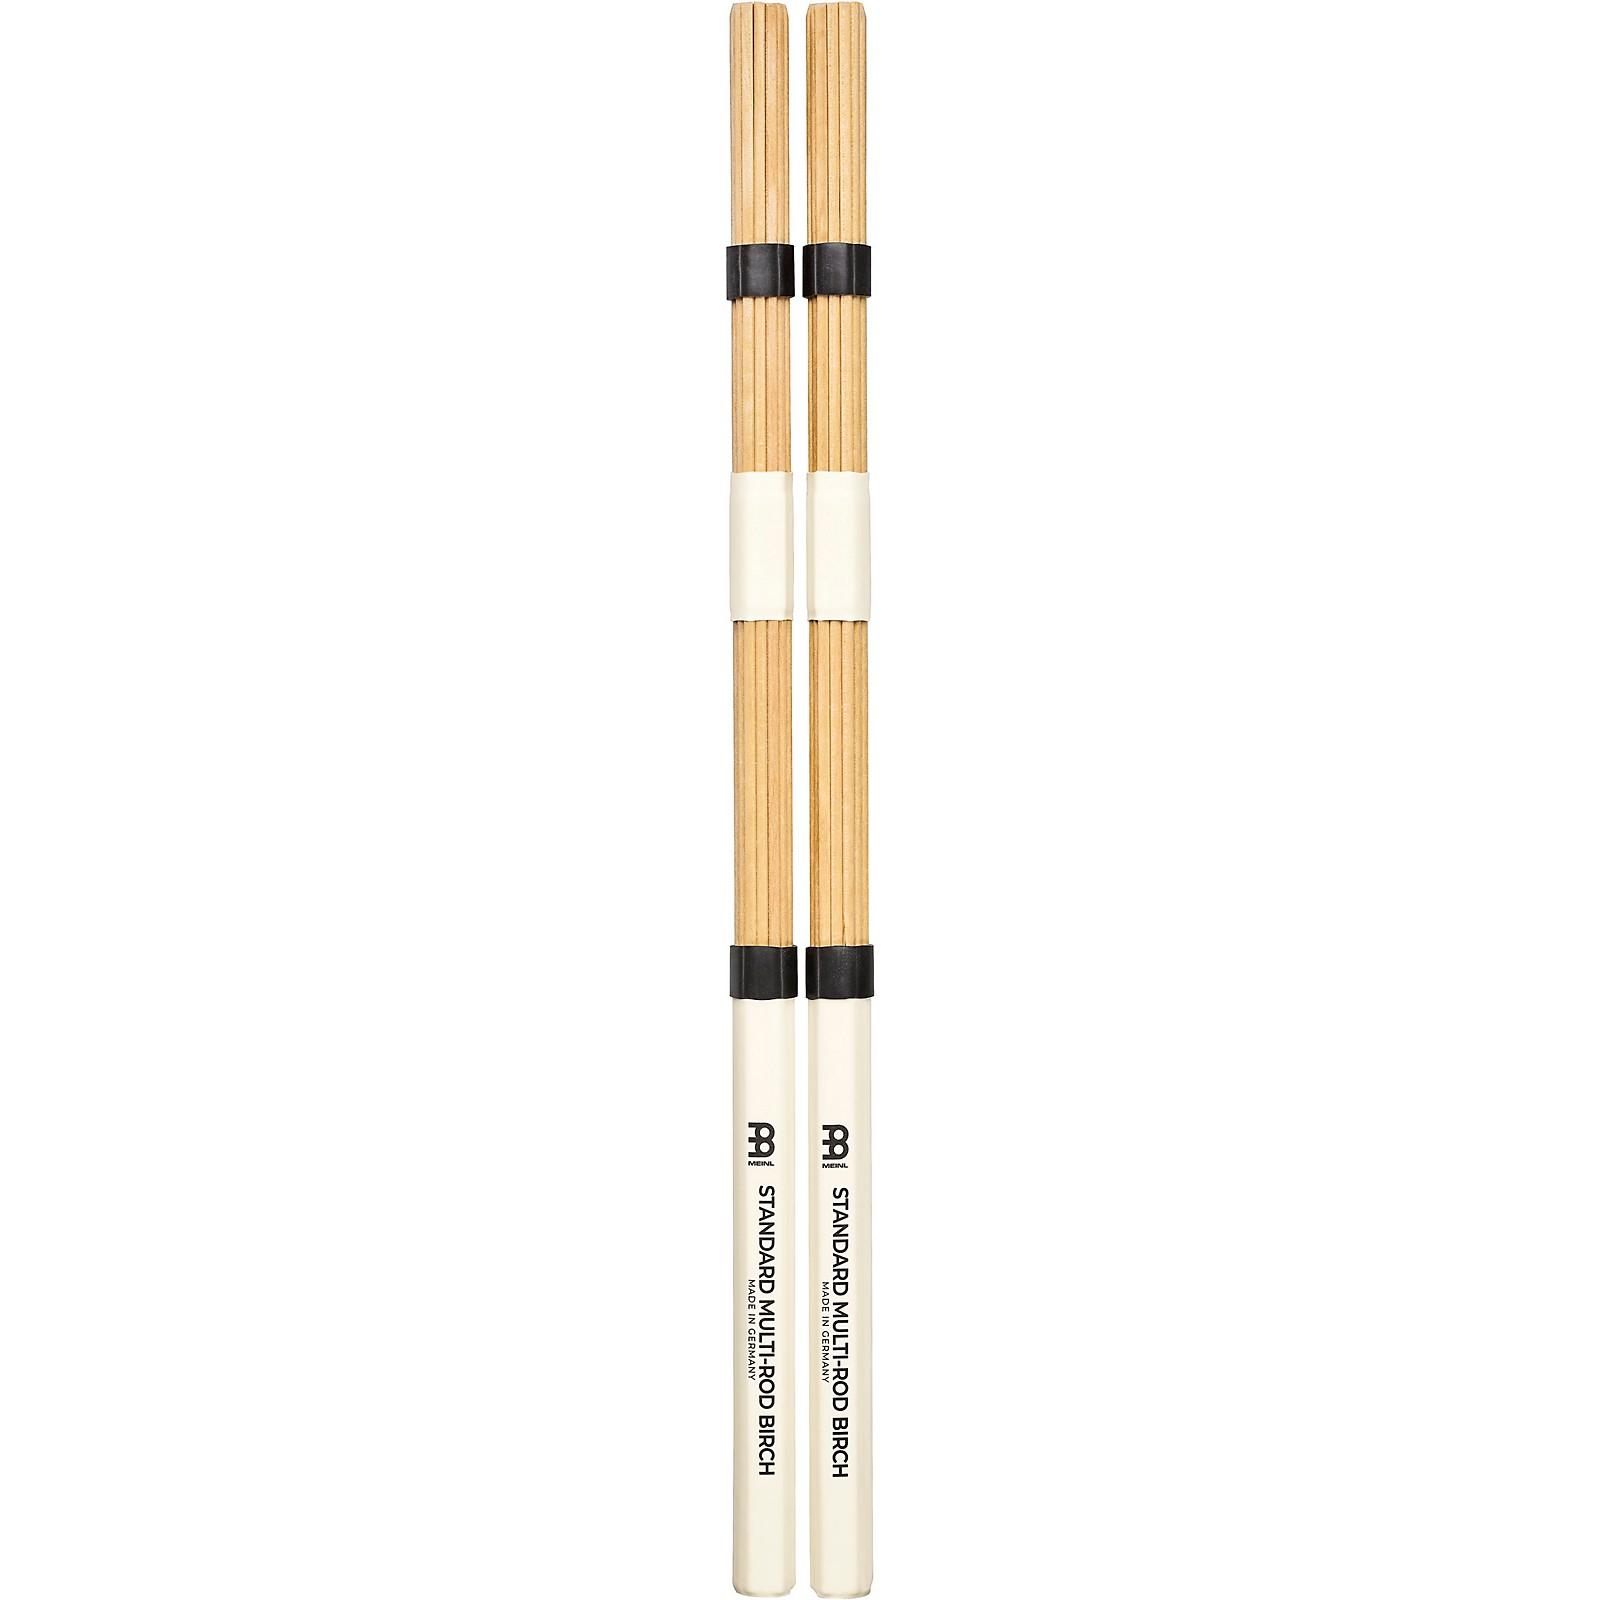 Meinl Stick & Brush Birch Standard Multi-Rods